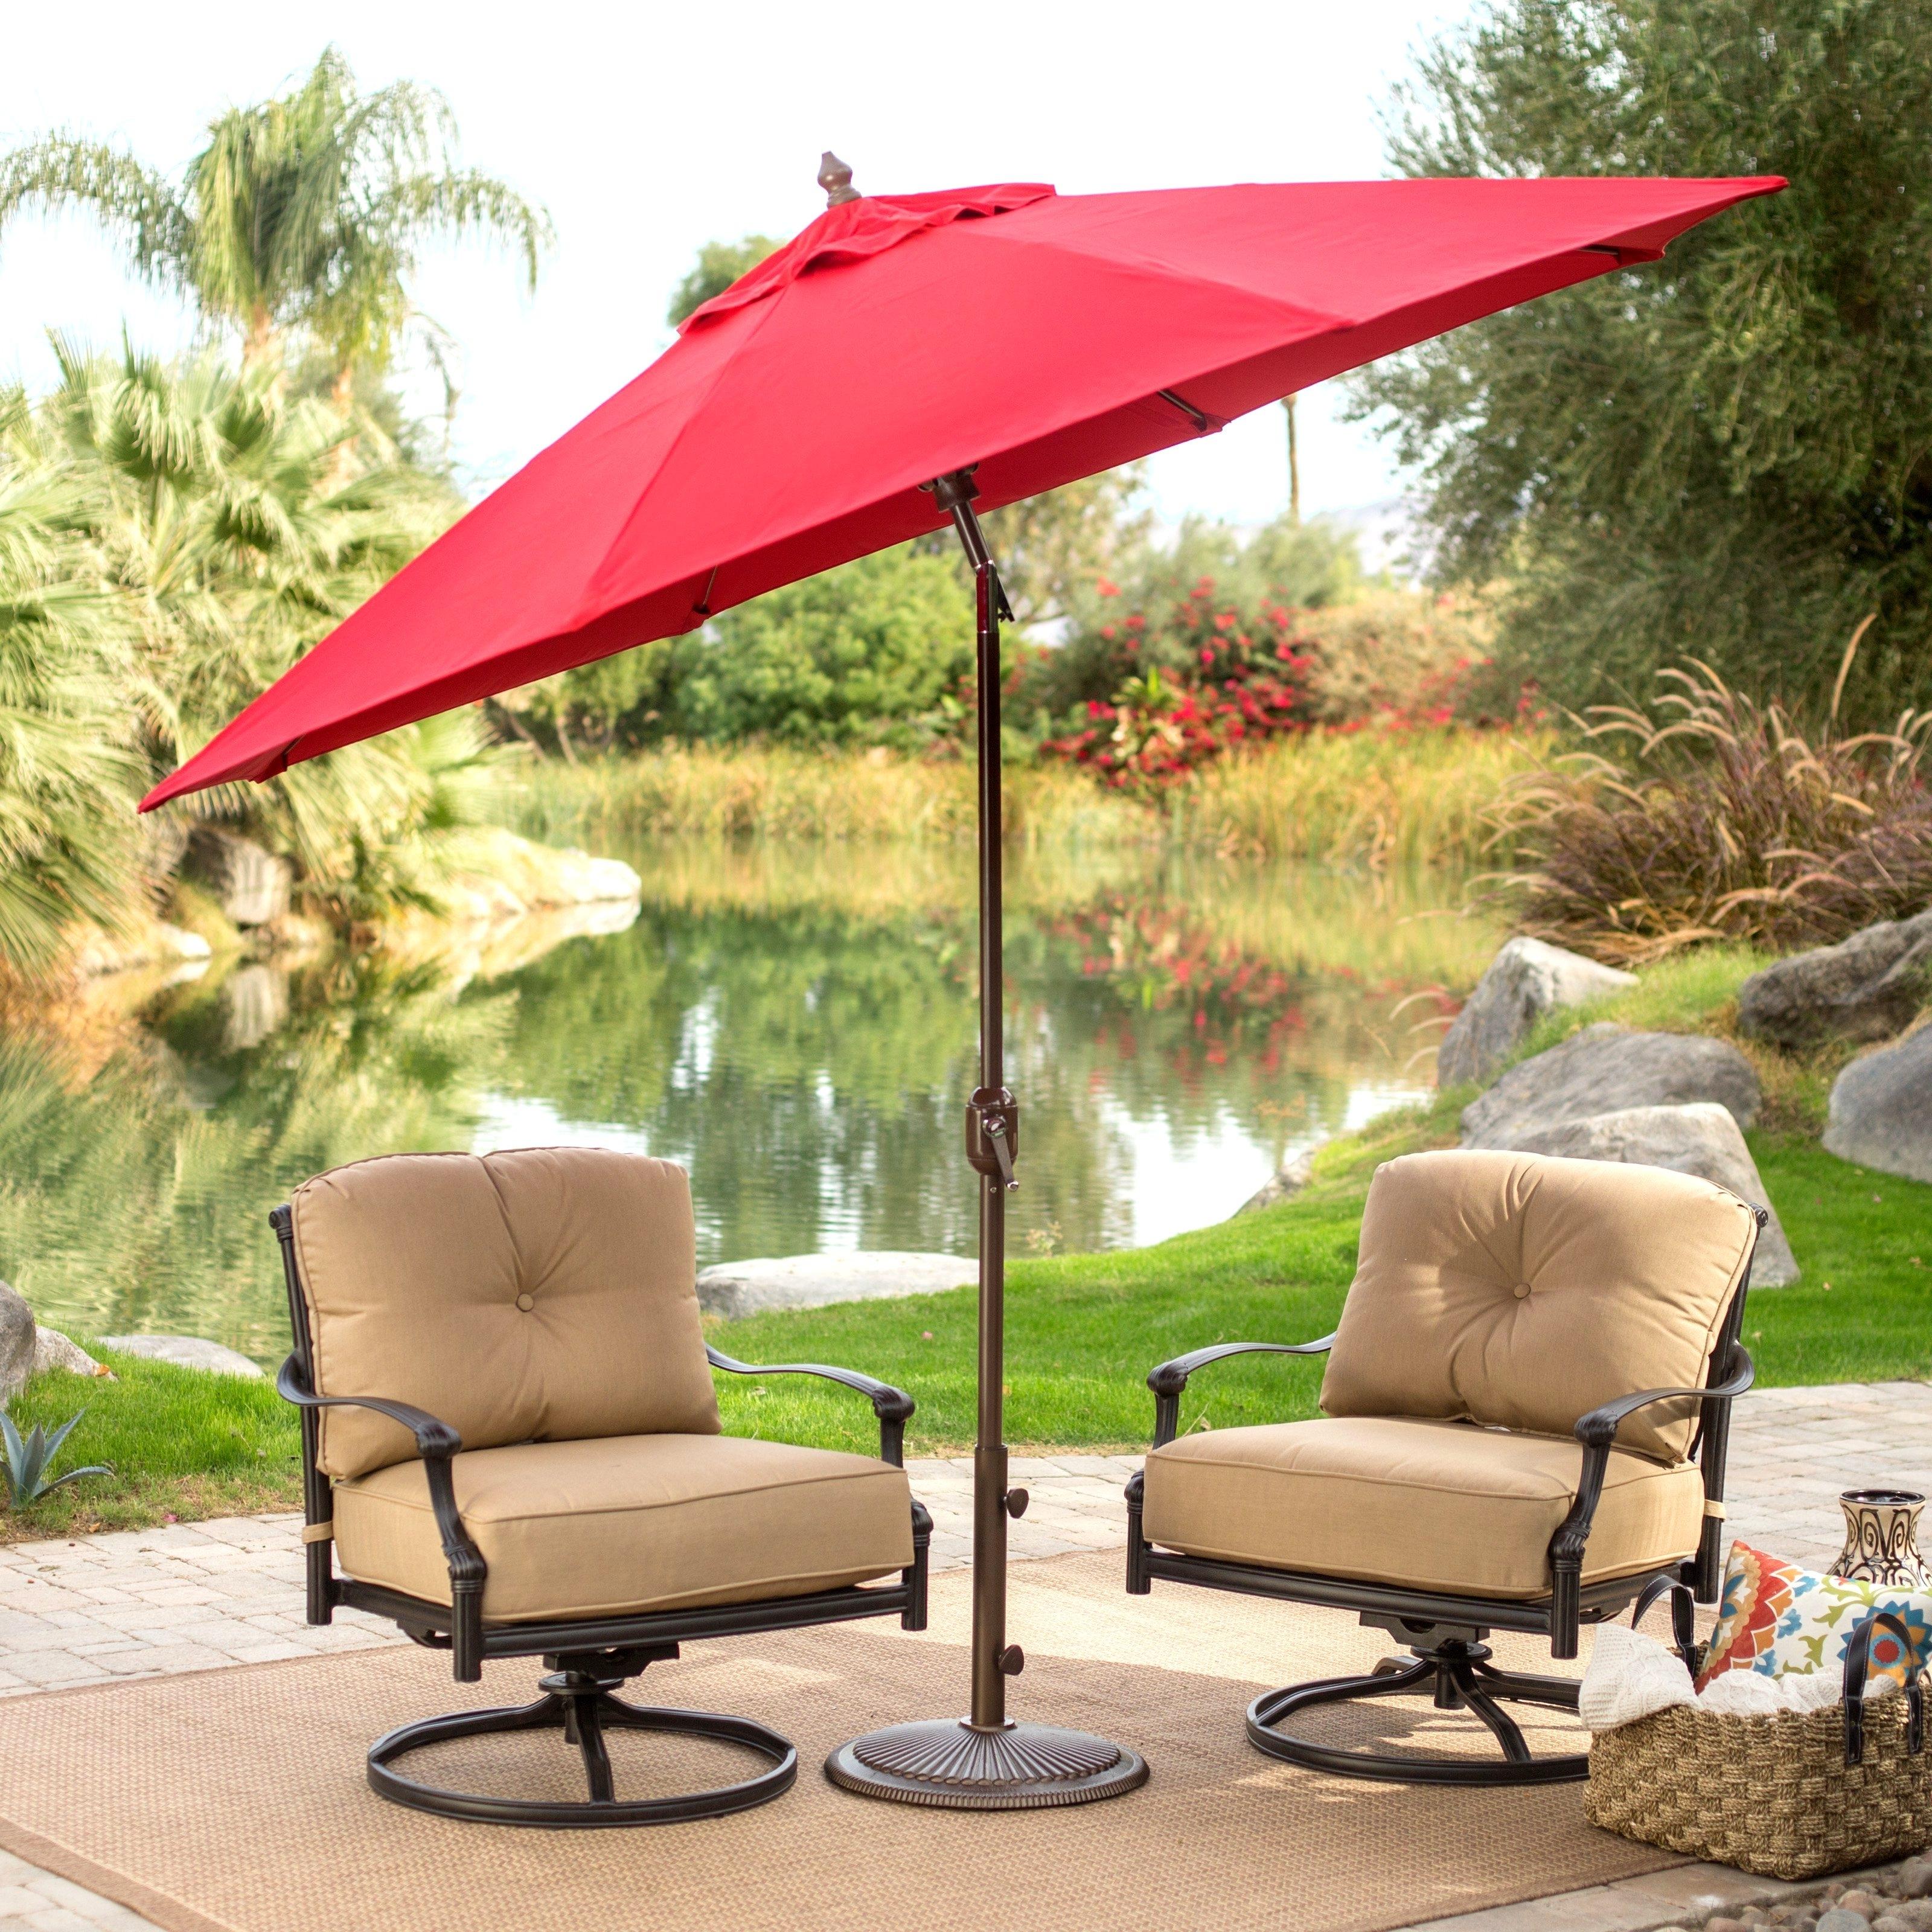 Latest Vinyl Patio Umbrellas Intended For 25 Fresh Patio Umbrella Free Standing (View 9 of 20)